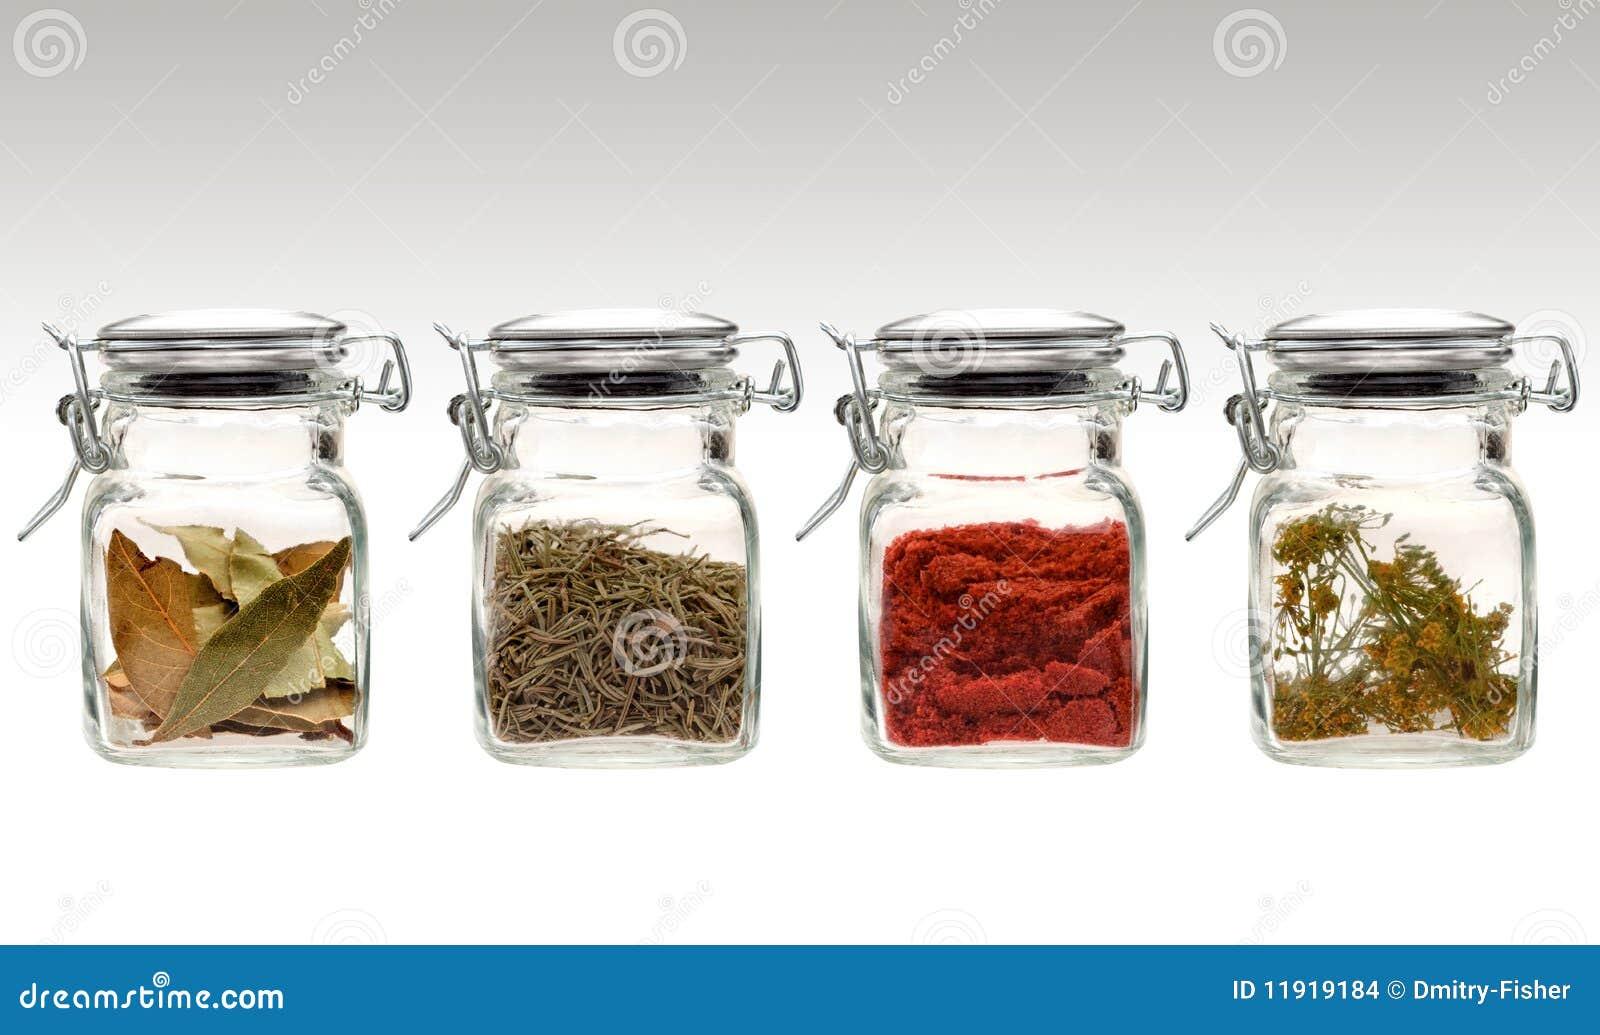 Spezie in vasi di vetro liberi fotografia stock immagine for Vasi ermetici vetro